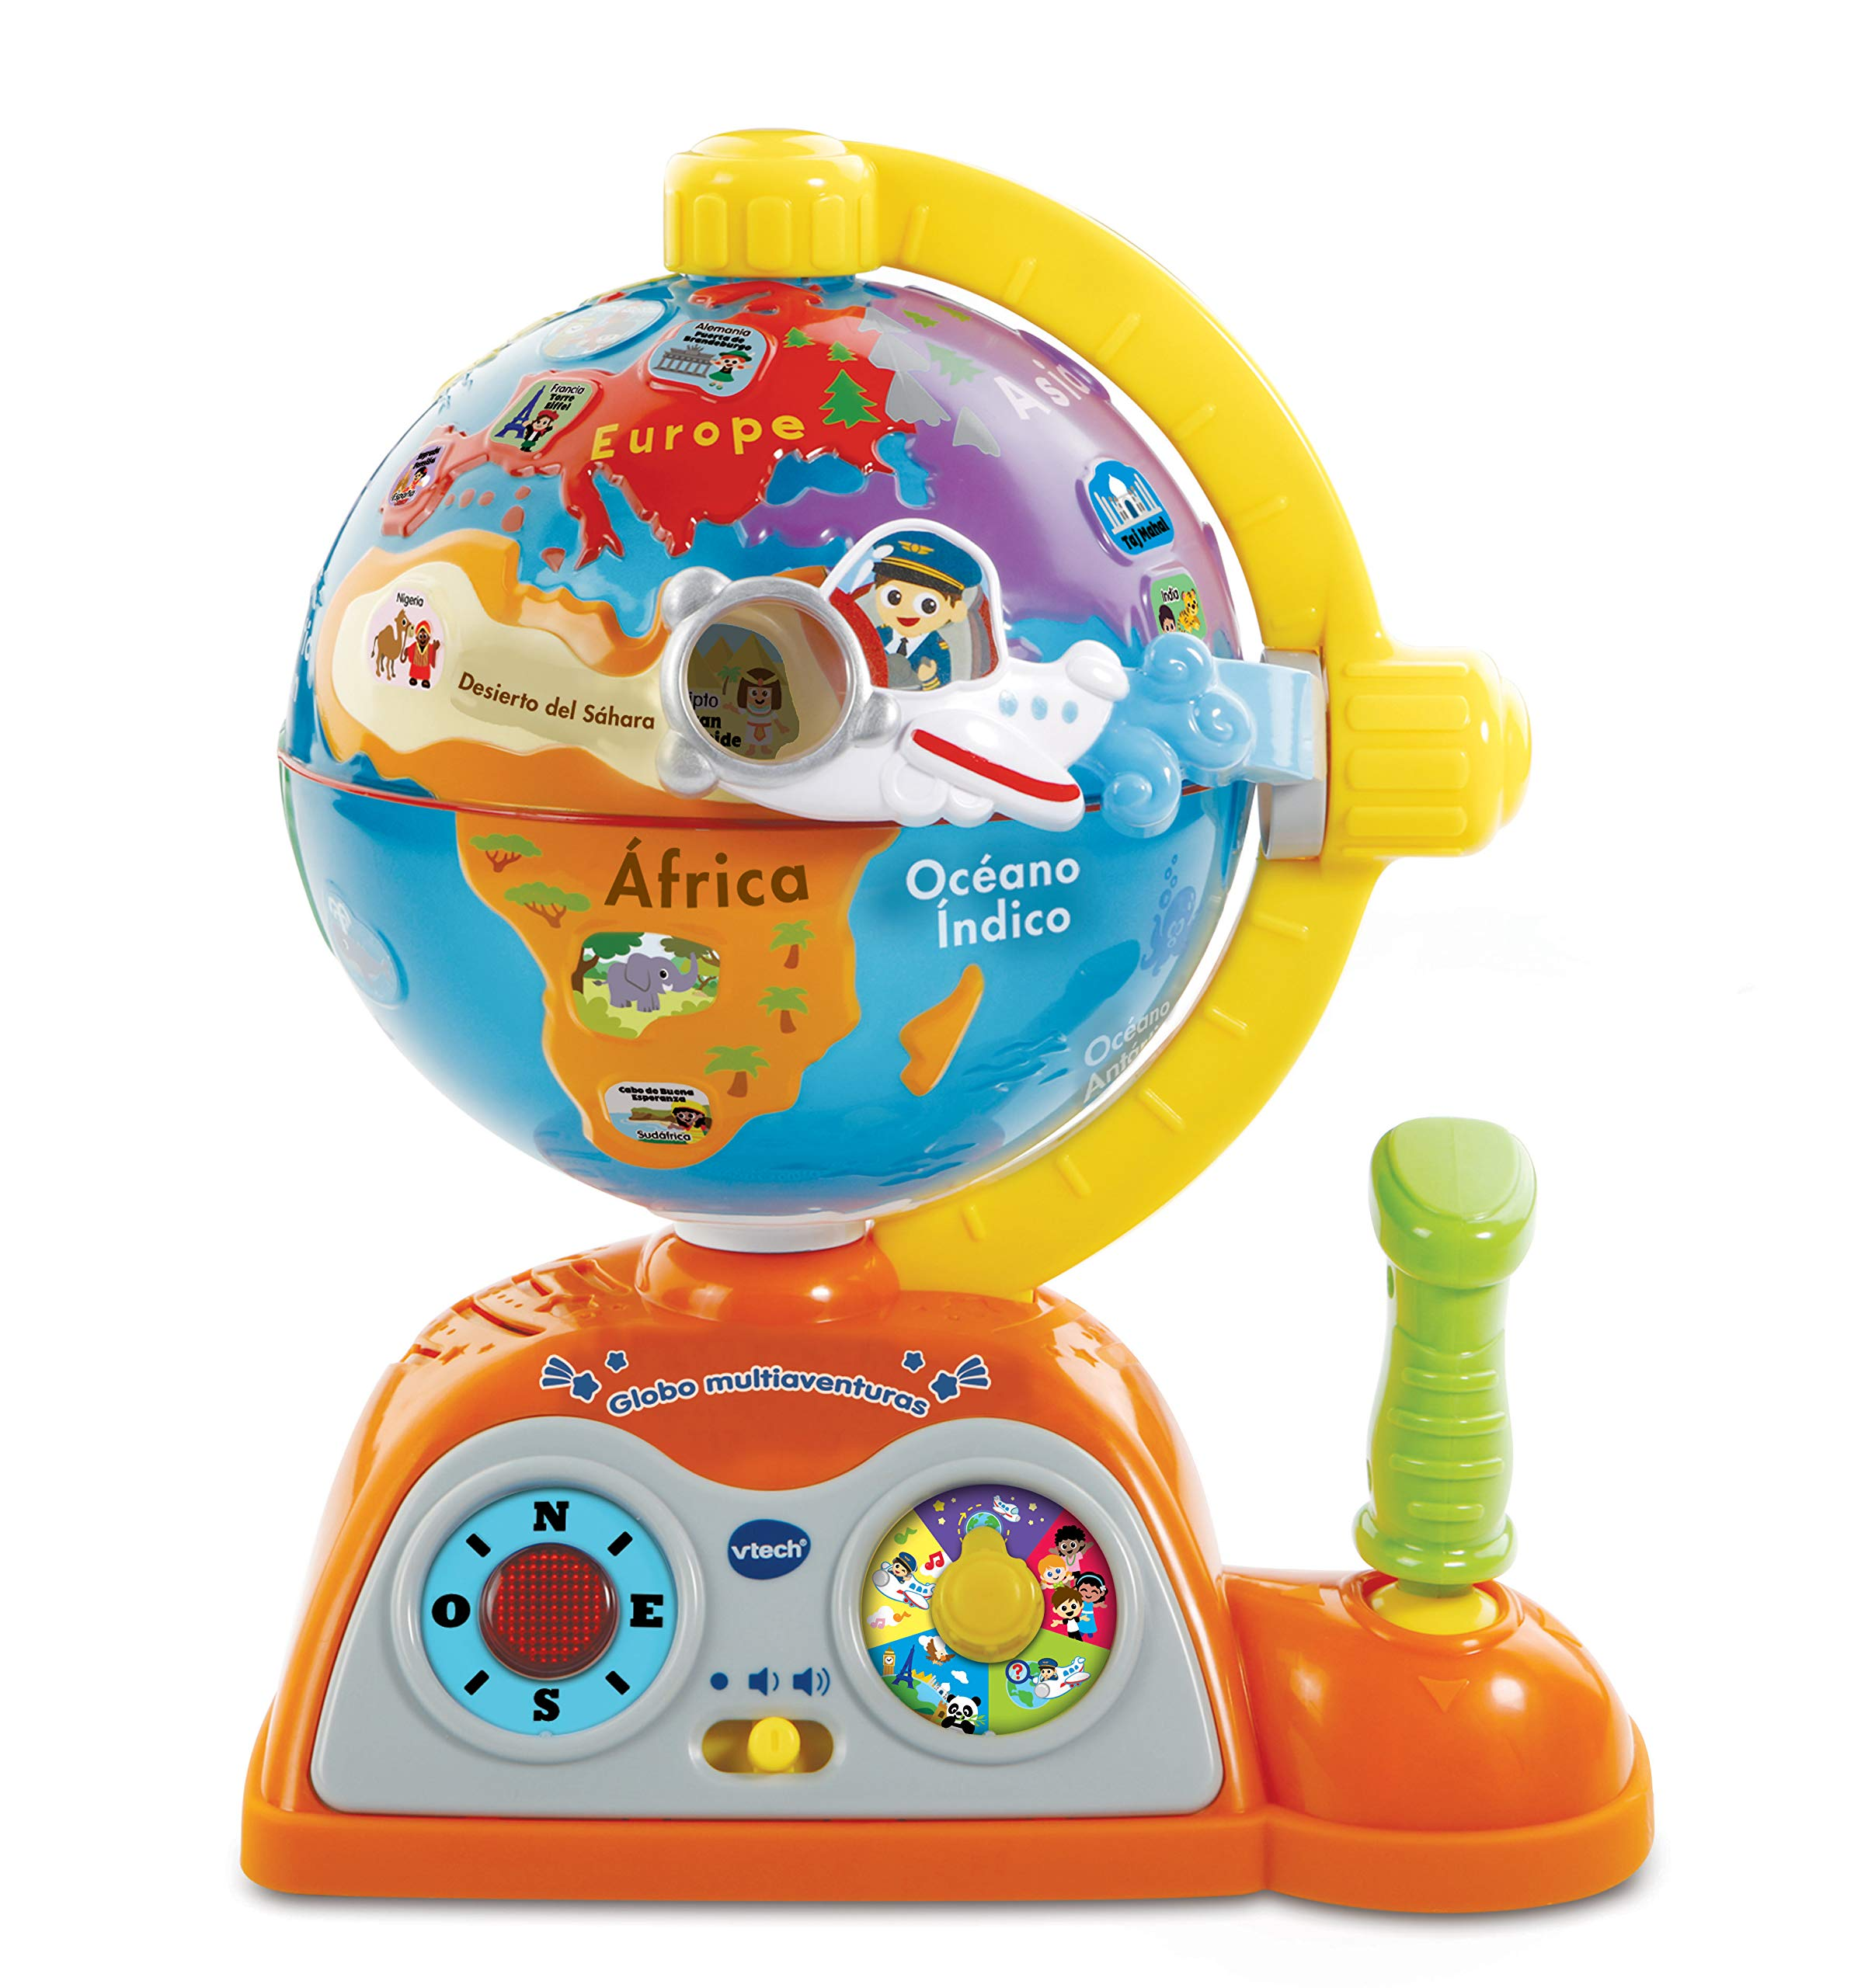 VTech – Globo multiaventuras, infantil interactivo que enseña geografía, continentes, océanos y monumentos, idiomas, animales y música (80-197822) , color/modelo surtido